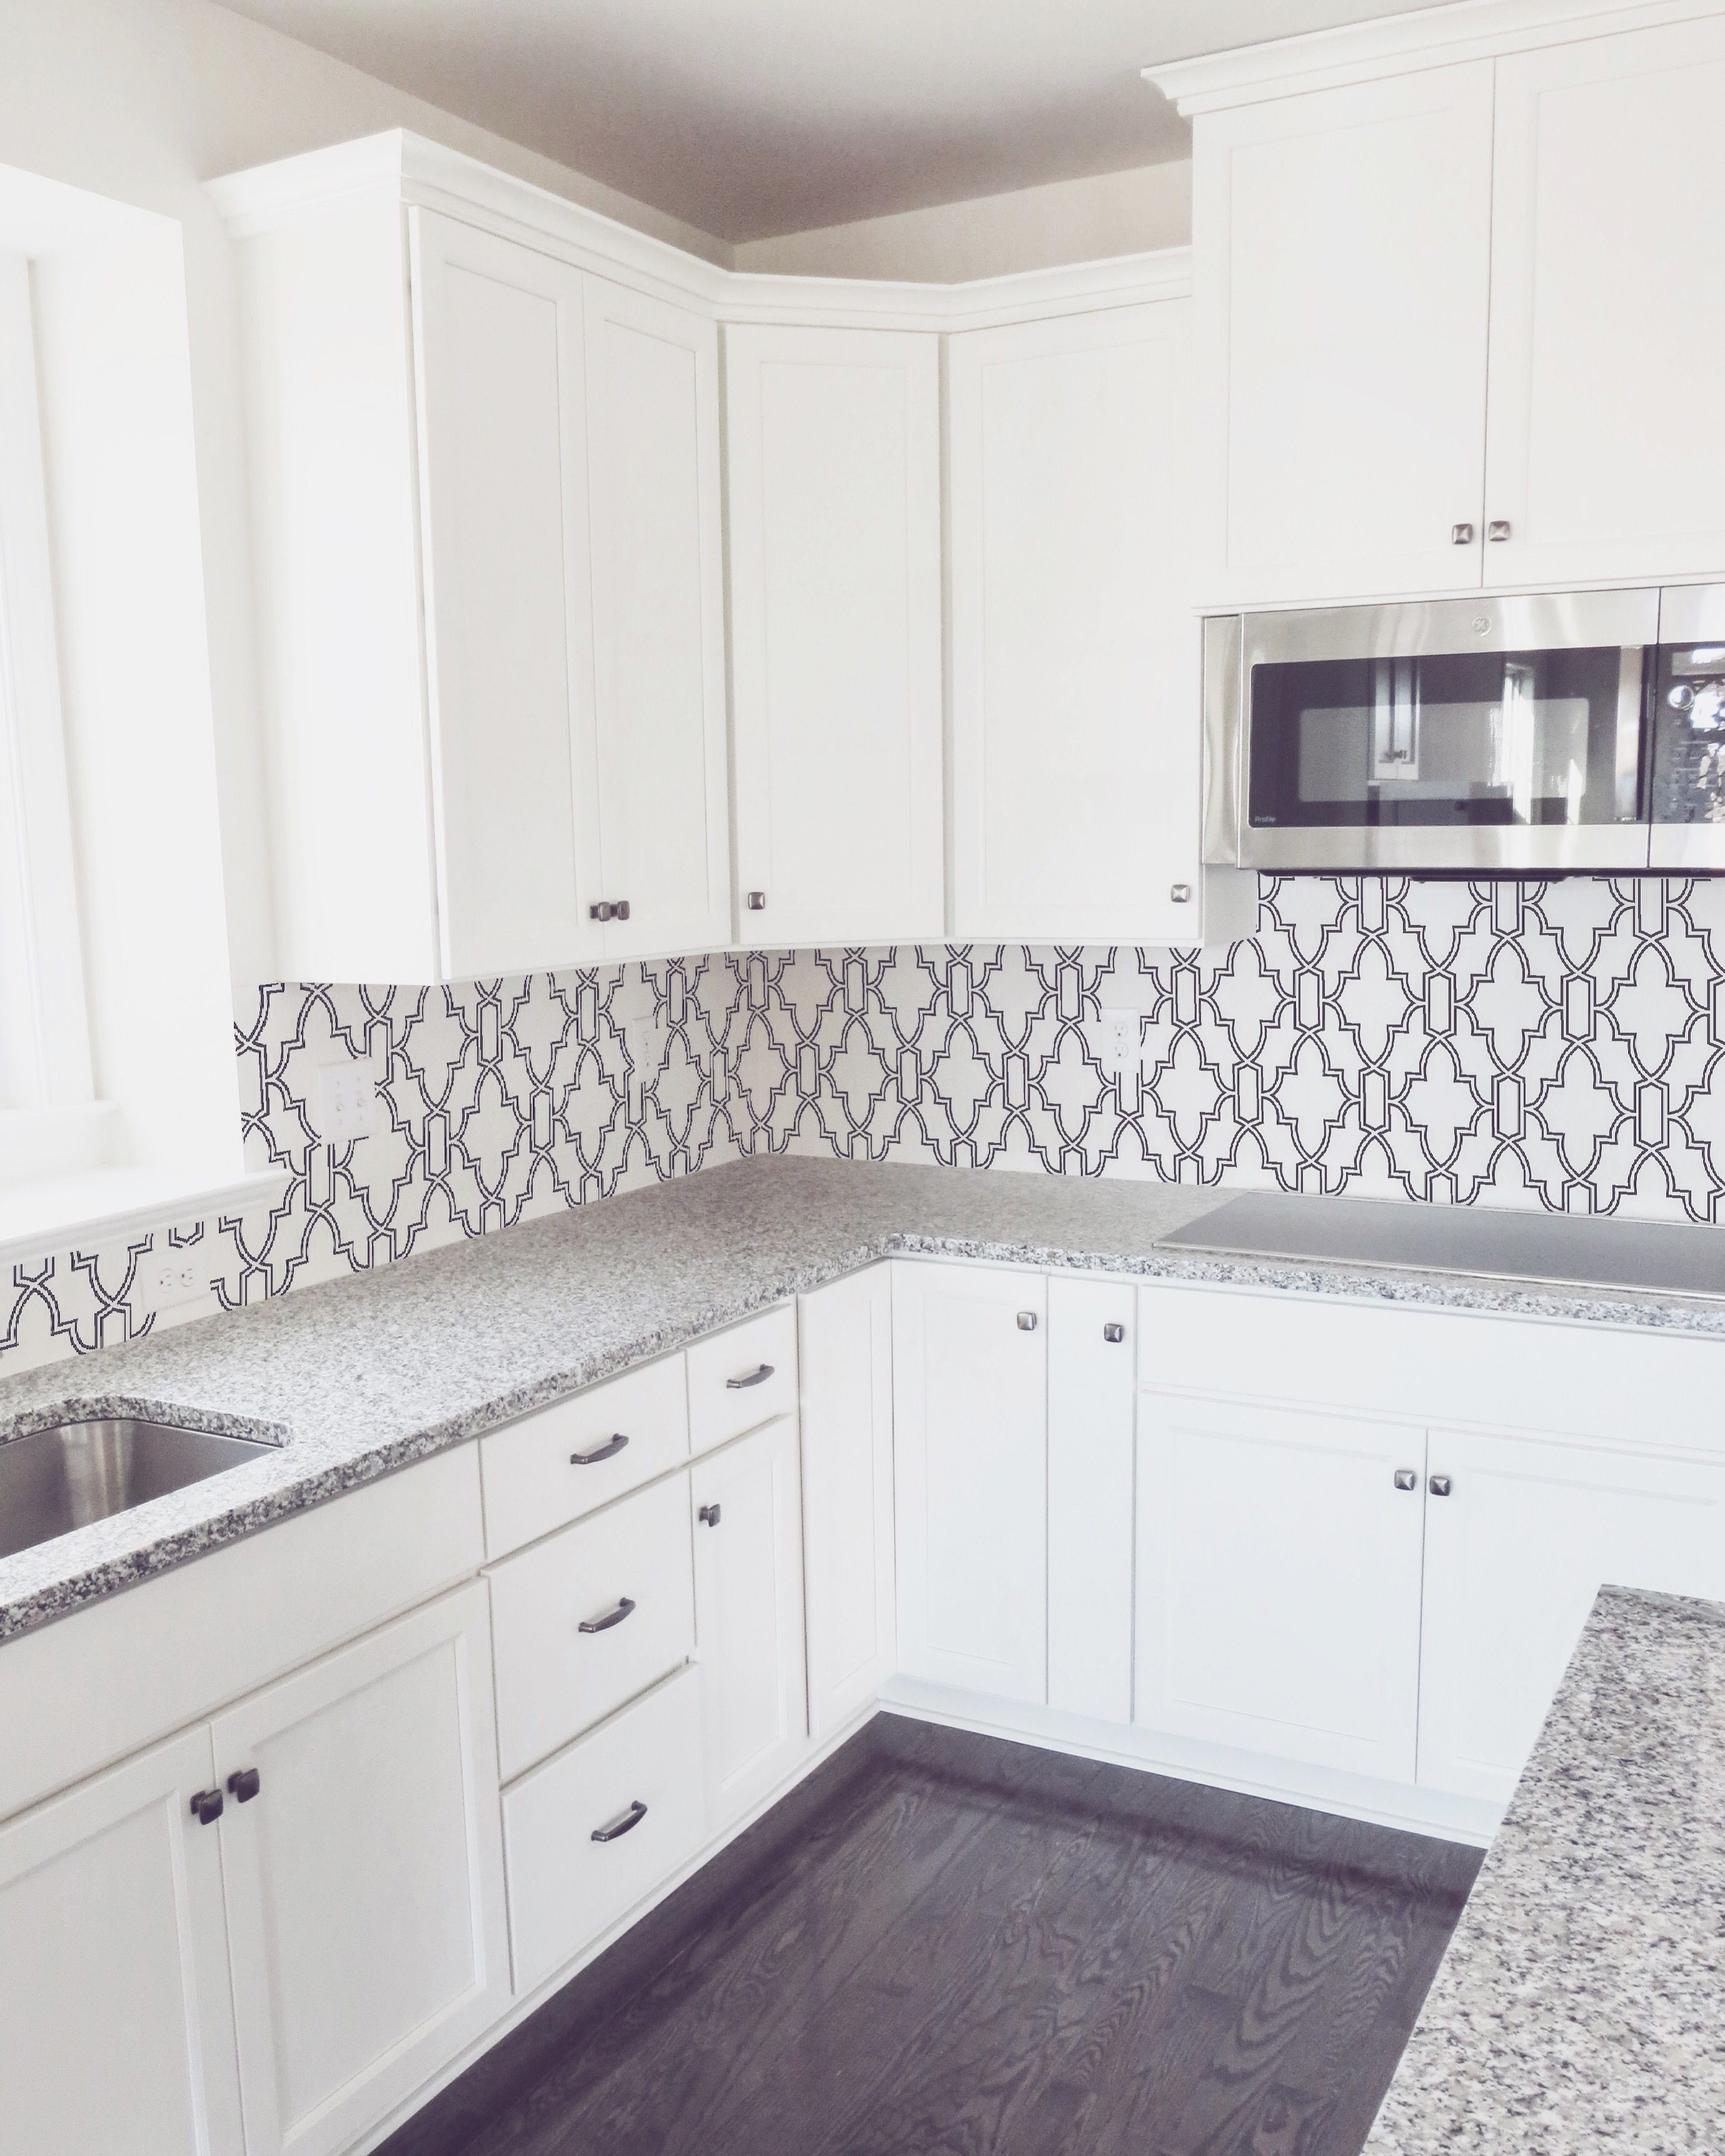 Kitchen Backsplash Peel And Stick Removable Wallpaper Kitchen